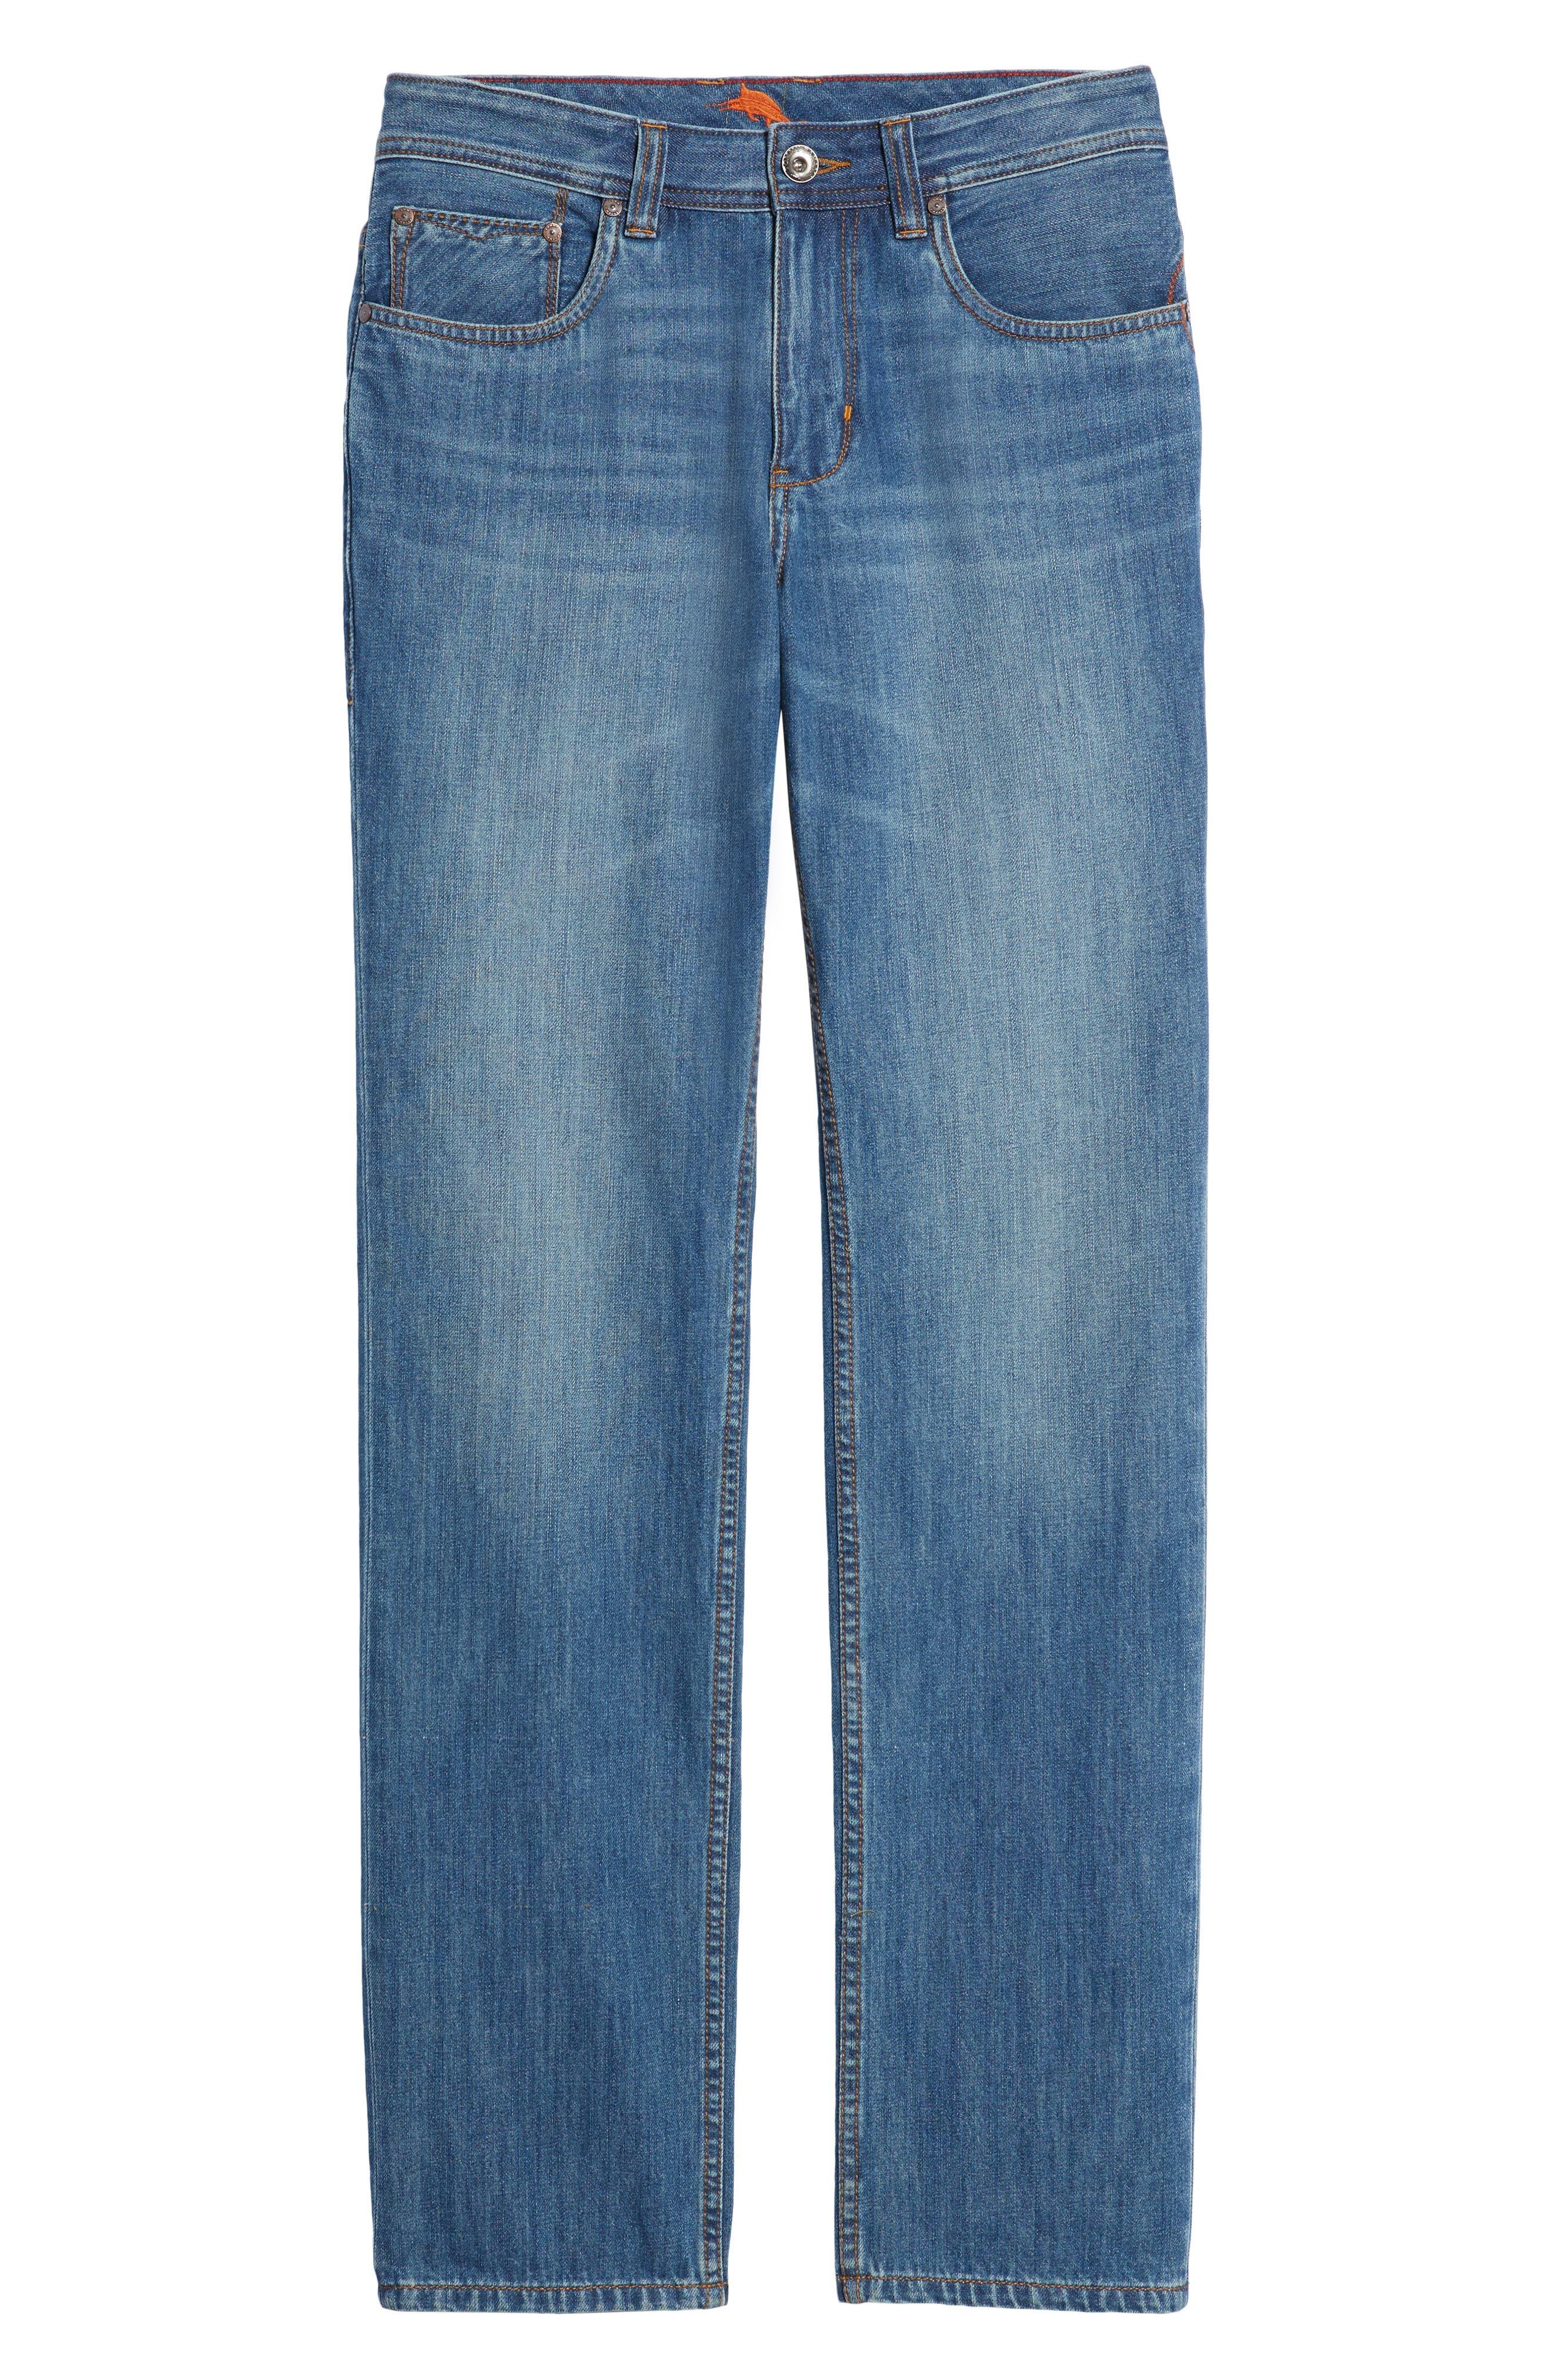 Bardabos Straight Leg Jeans,                             Alternate thumbnail 6, color,                             400